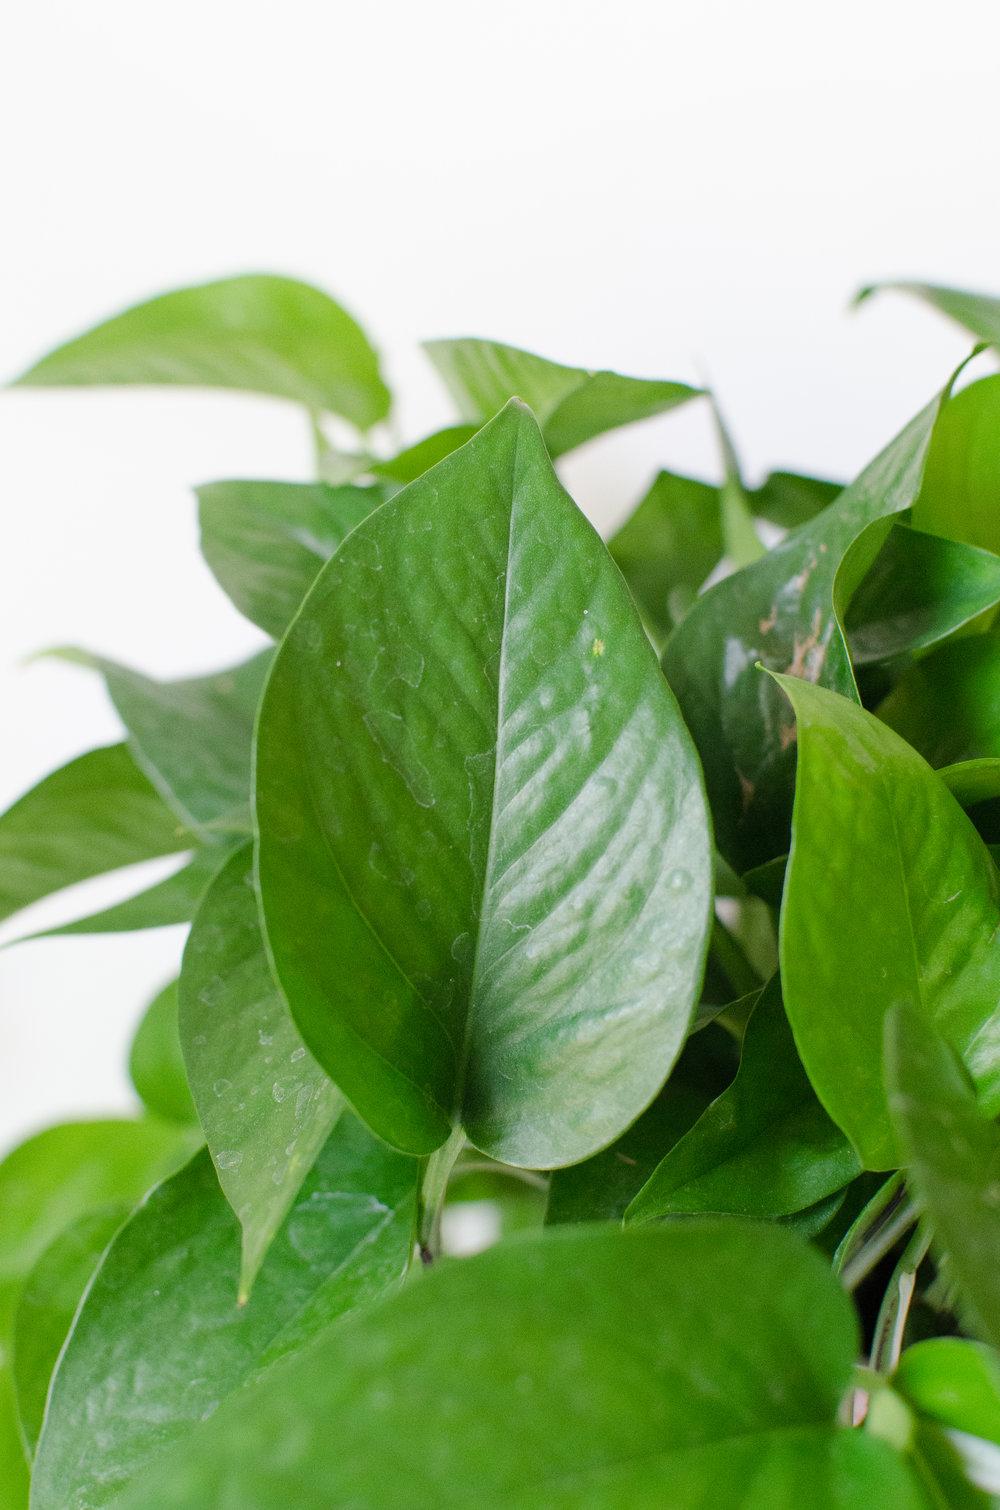 Pothos leaf up close.